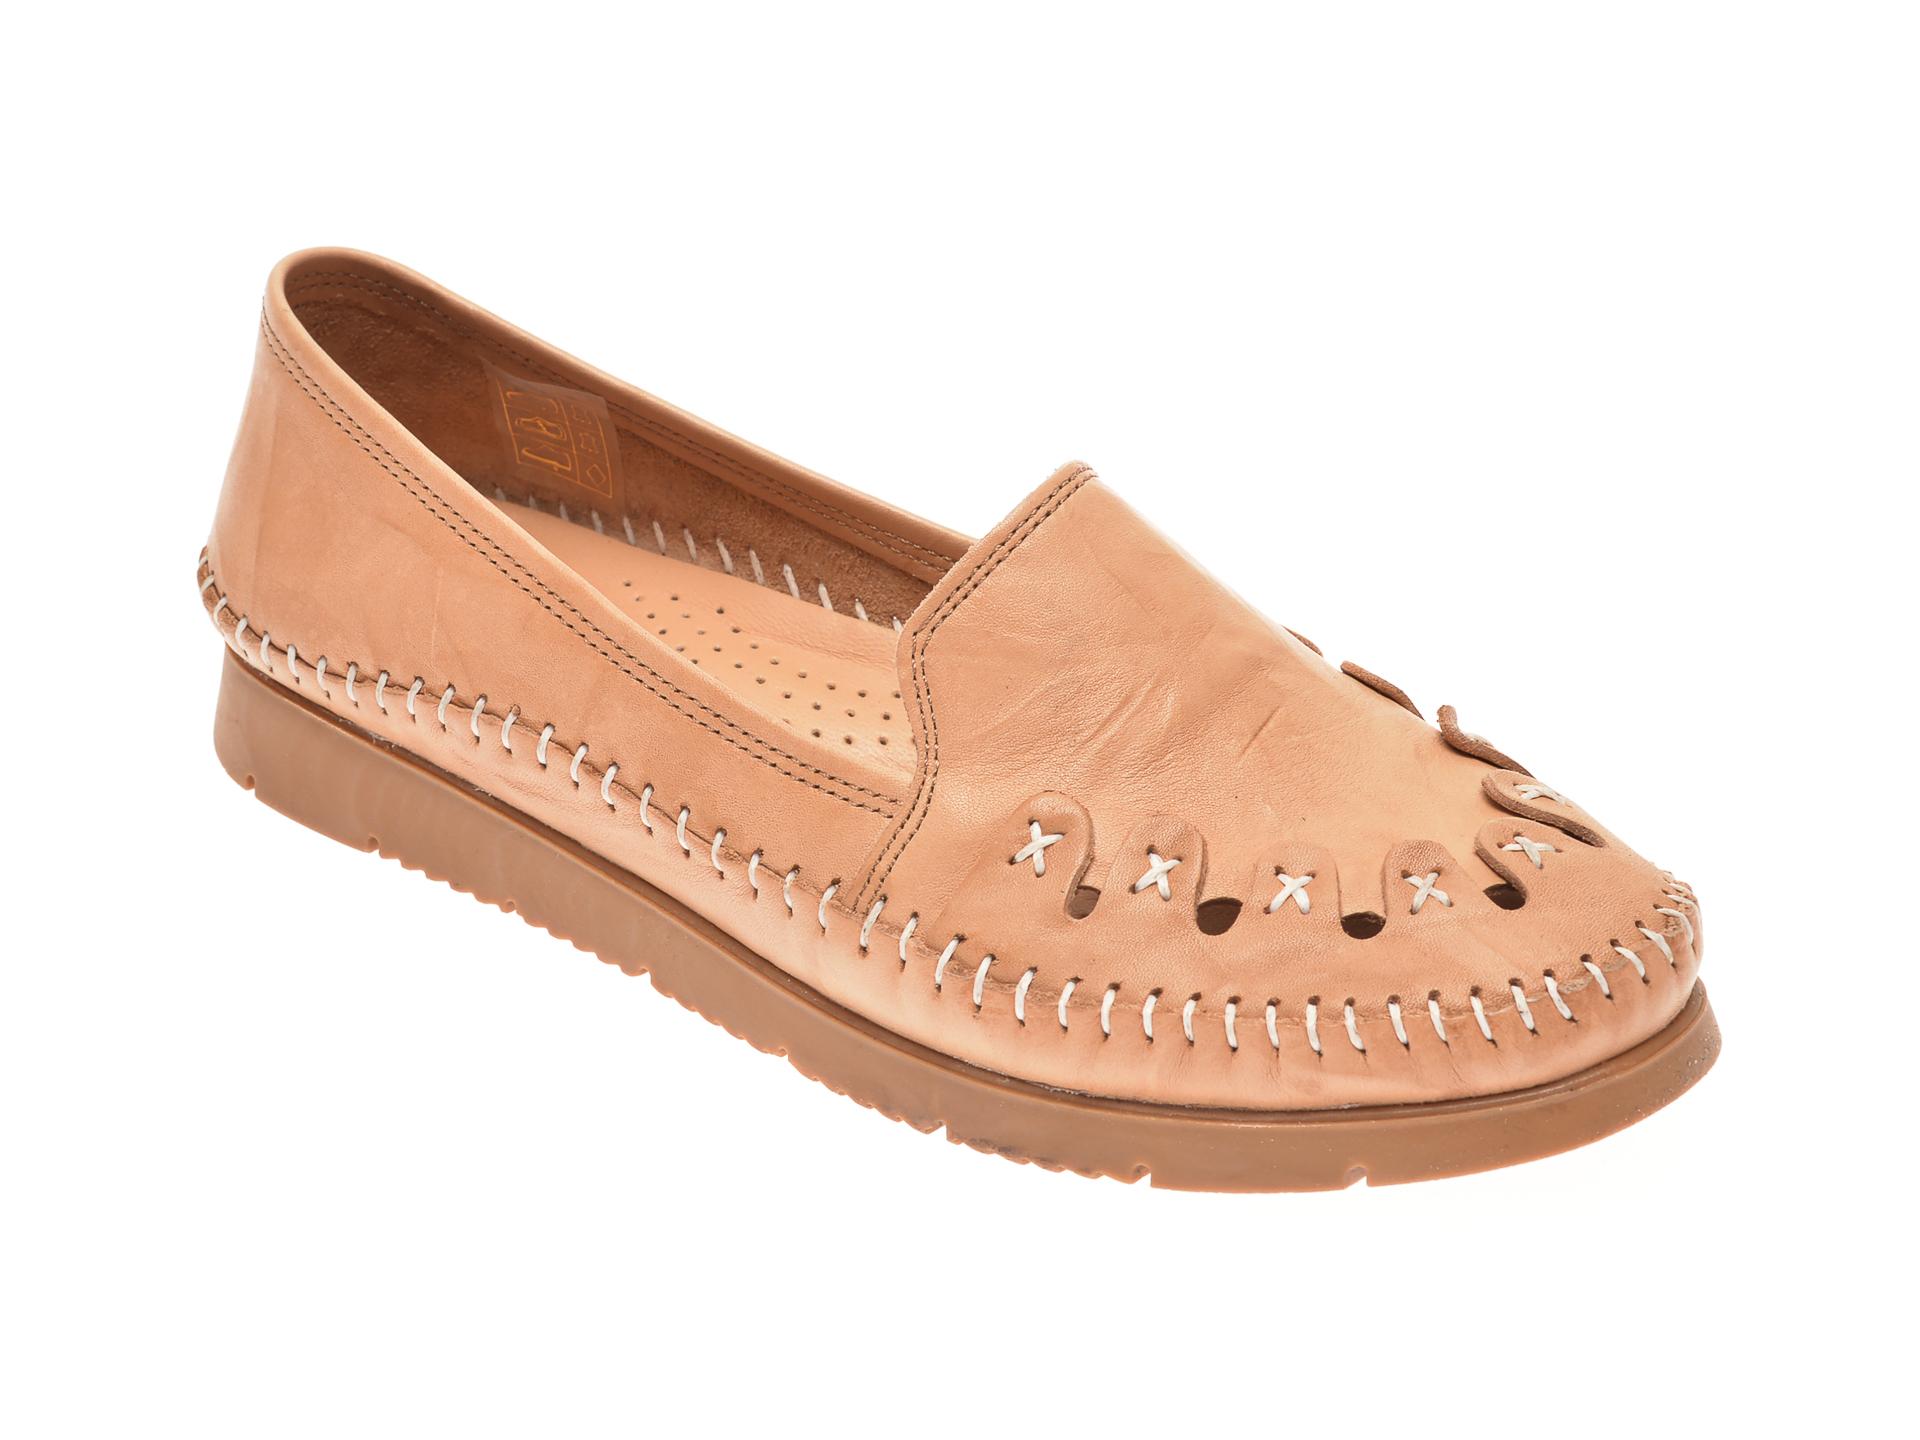 Pantofi ECLIPSE bej, 1429, din piele naturala